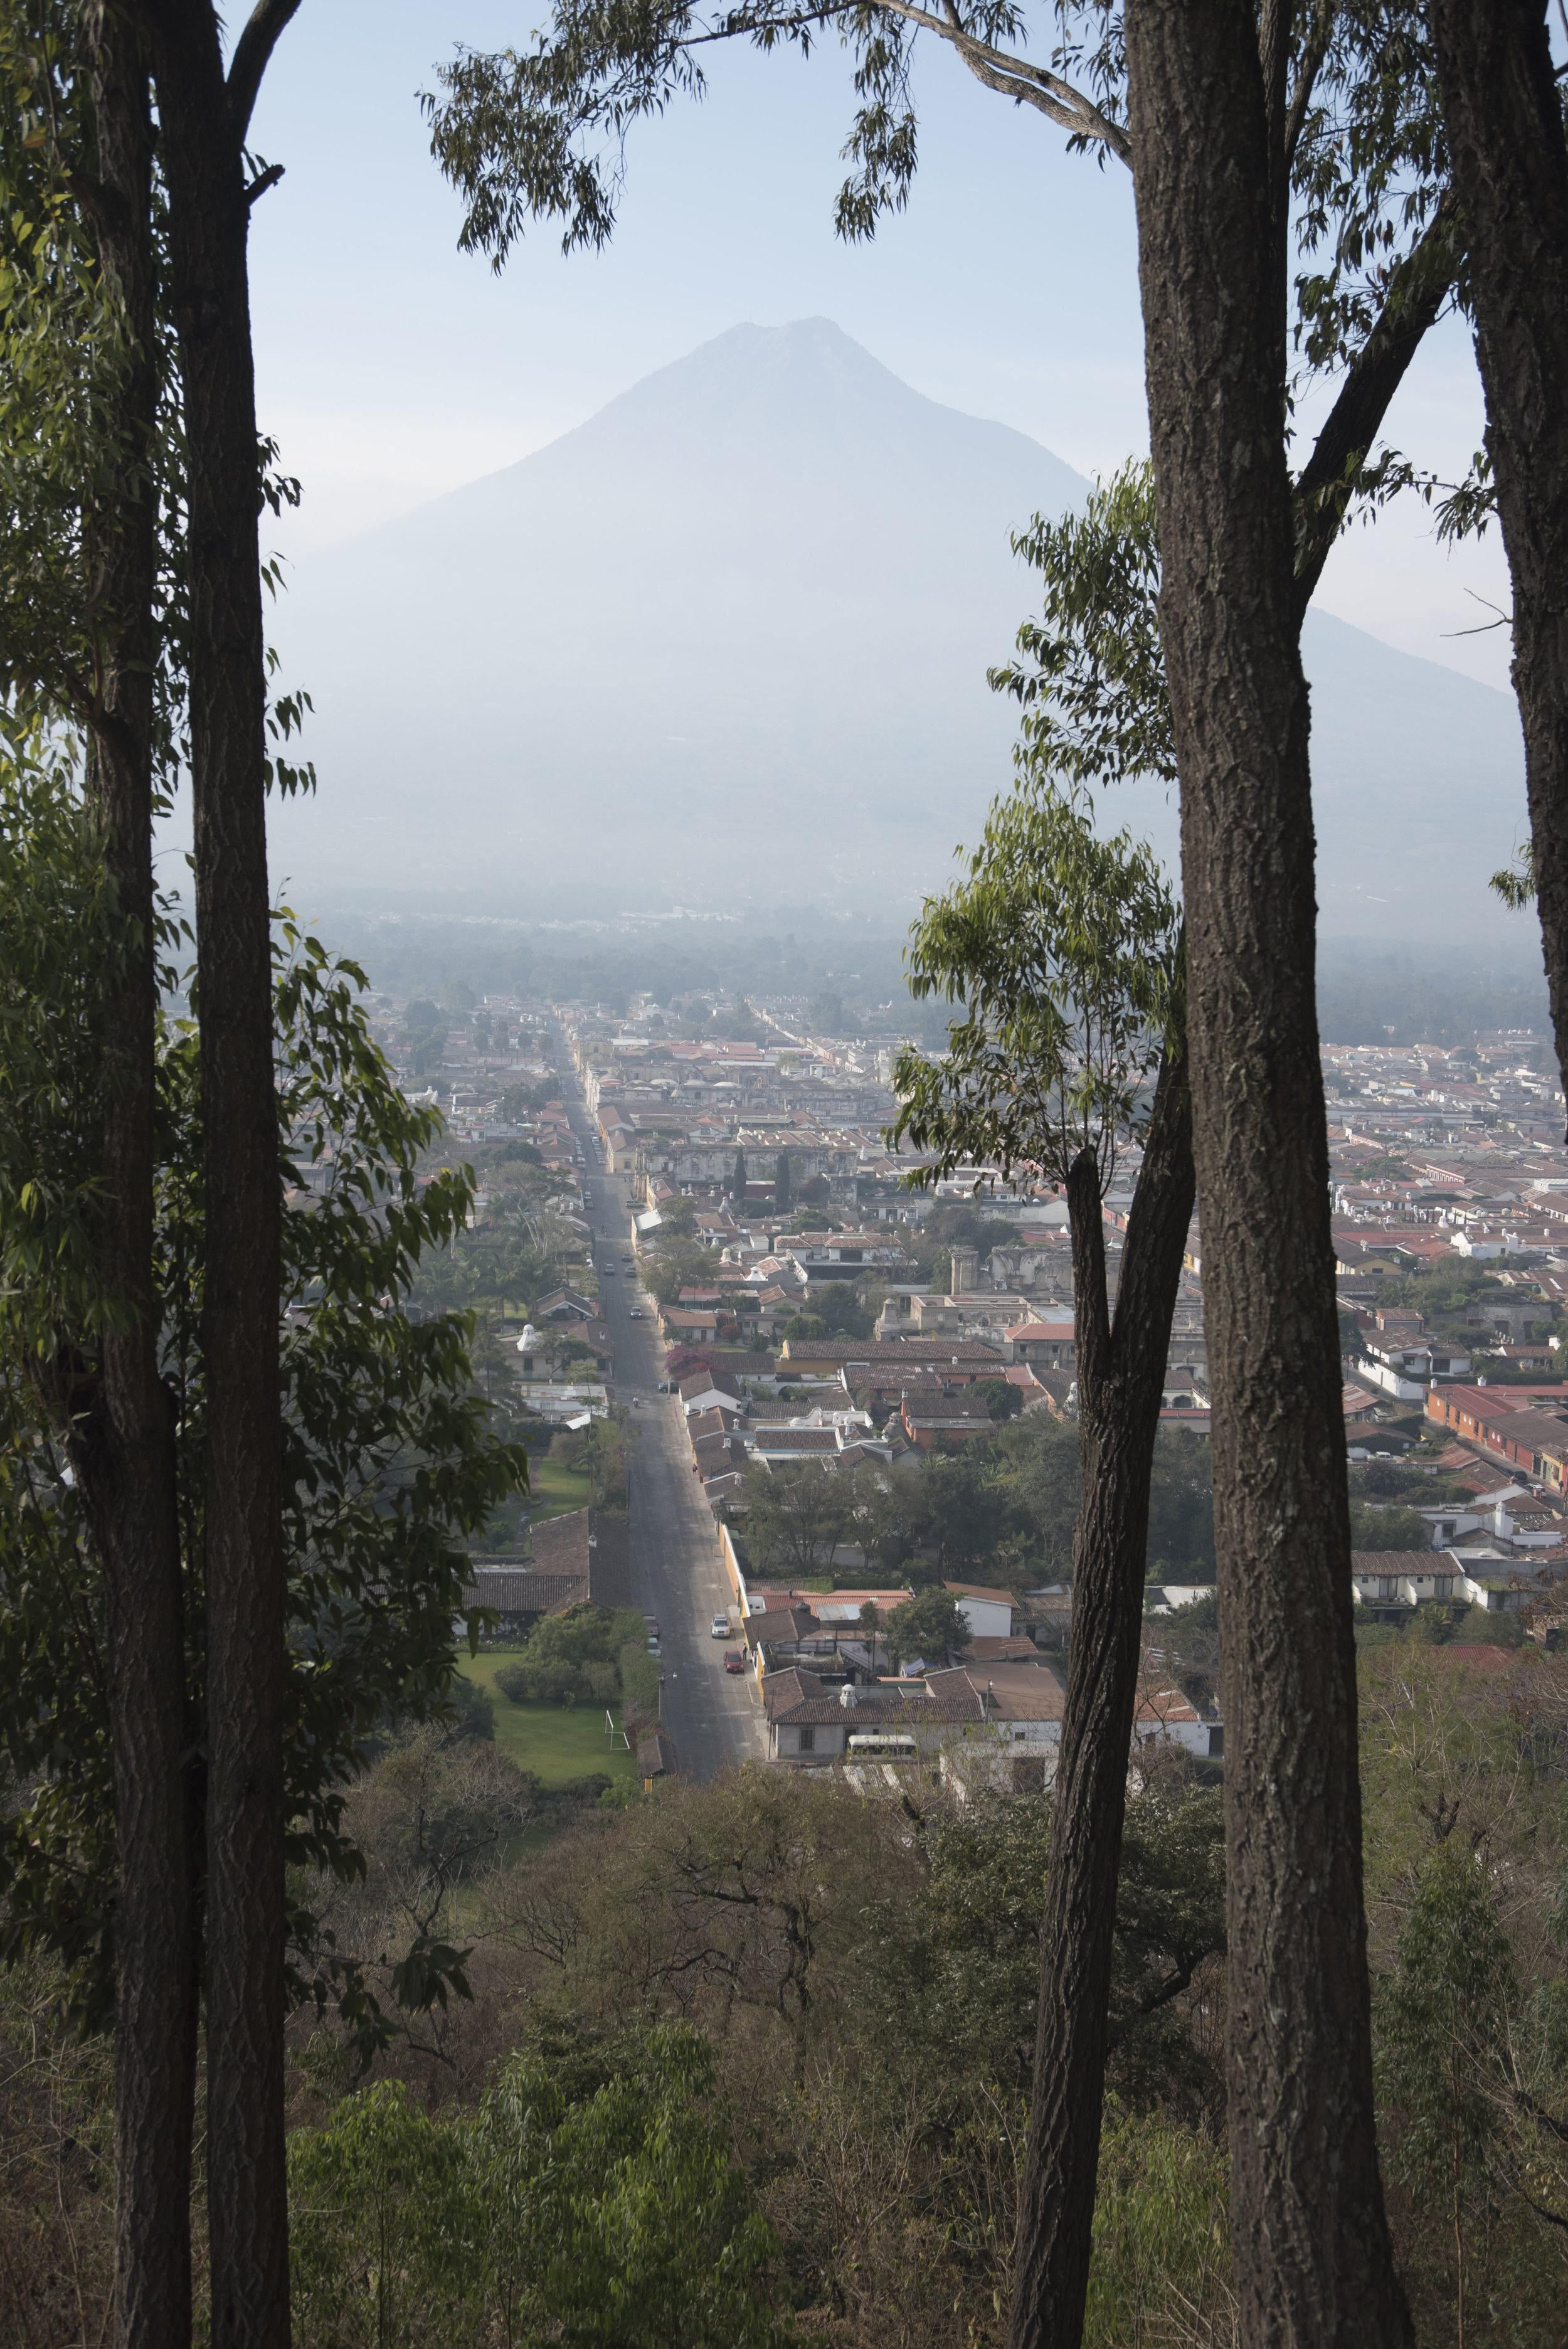 Creeping on Antigua and Volcan Agua through the trees from Cerro de la Cruz. (Antigua, Guatemala; Feb 2017)